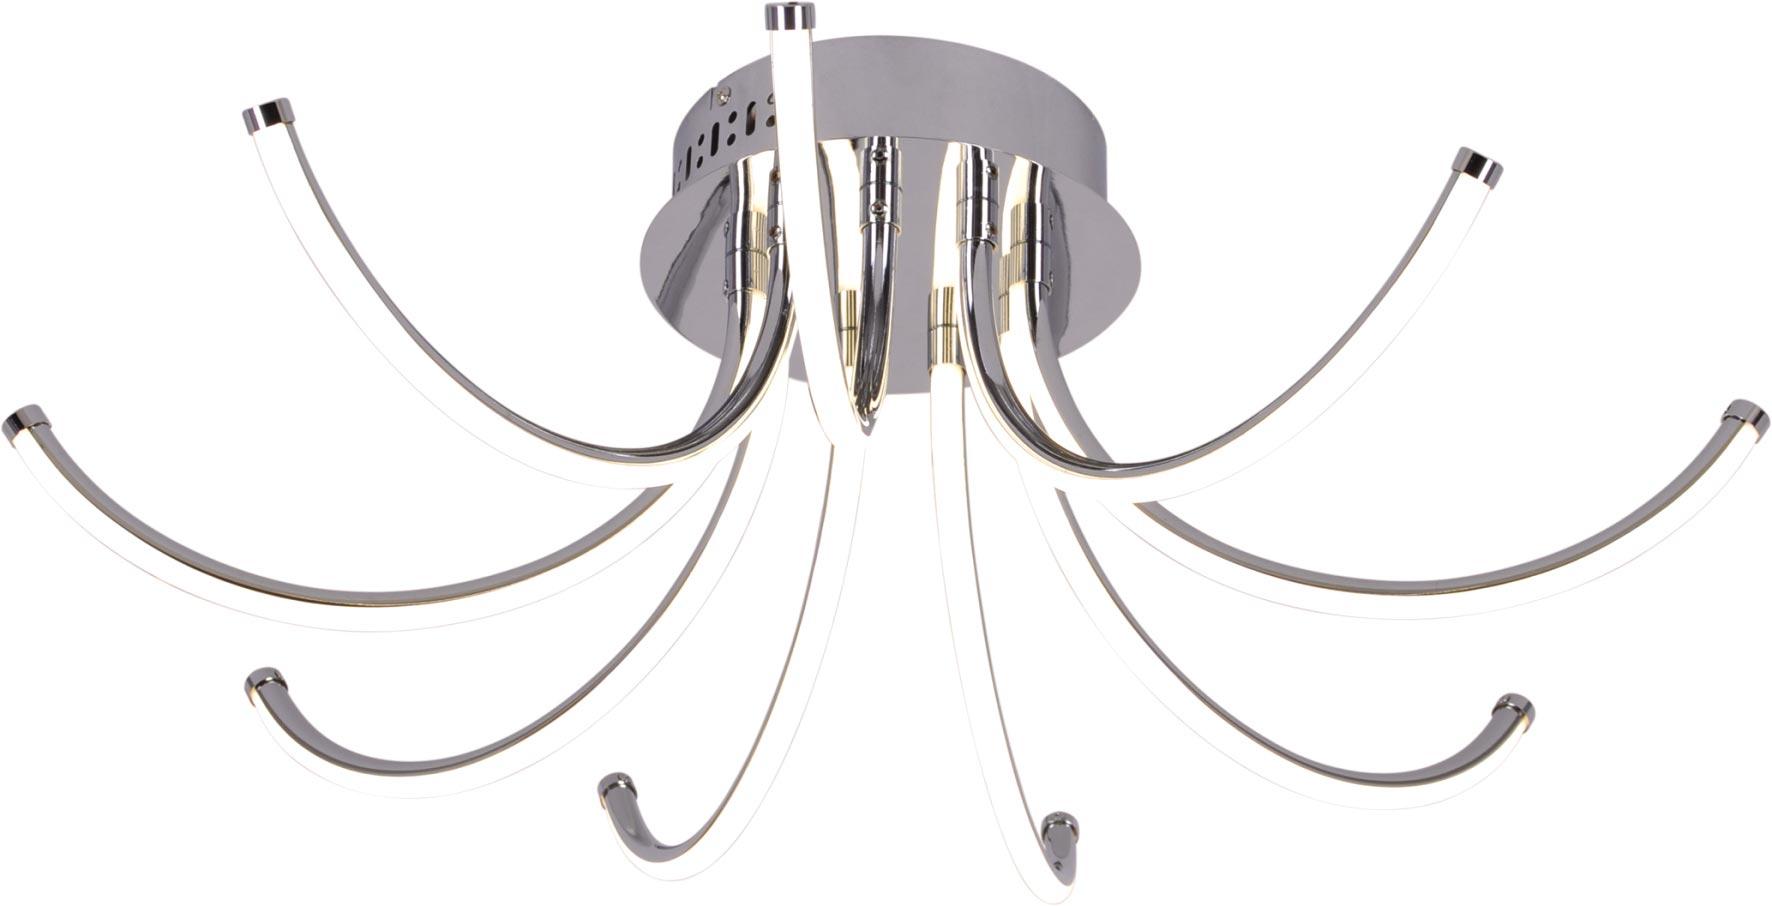 Lampa sufitowa K-8098 z serii LOGI